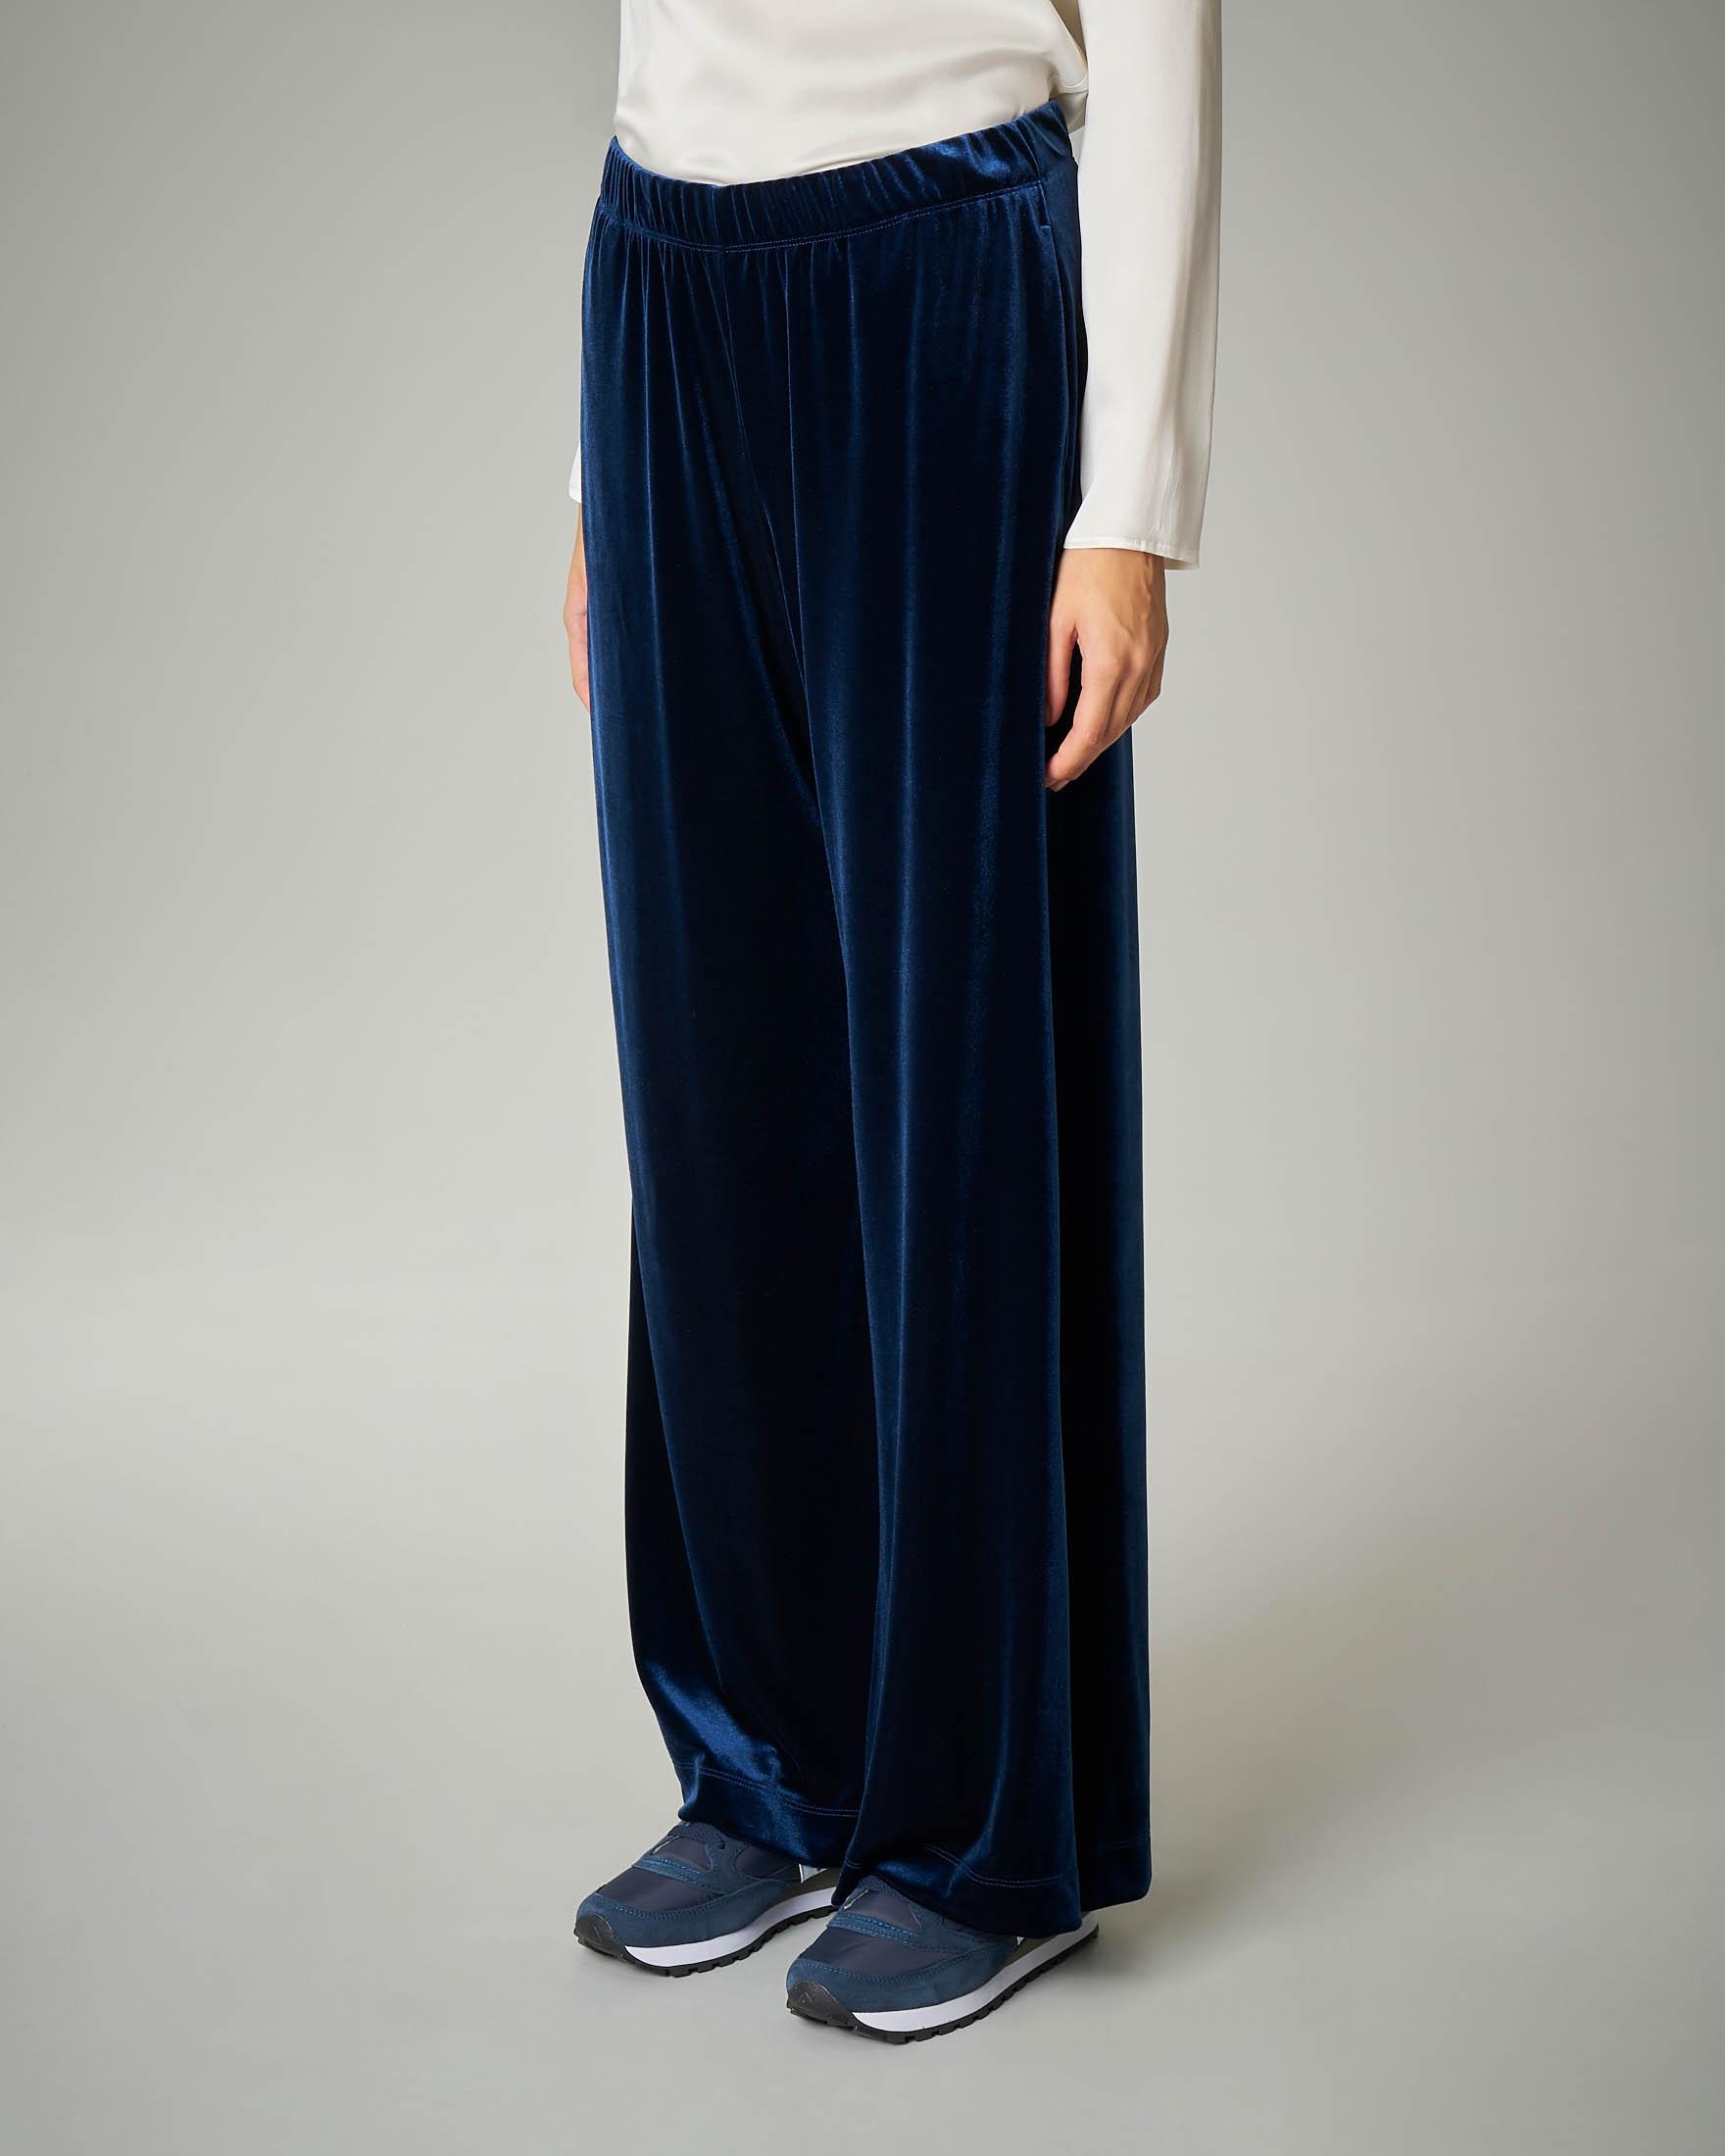 Pantalone palazzo blu in velluto